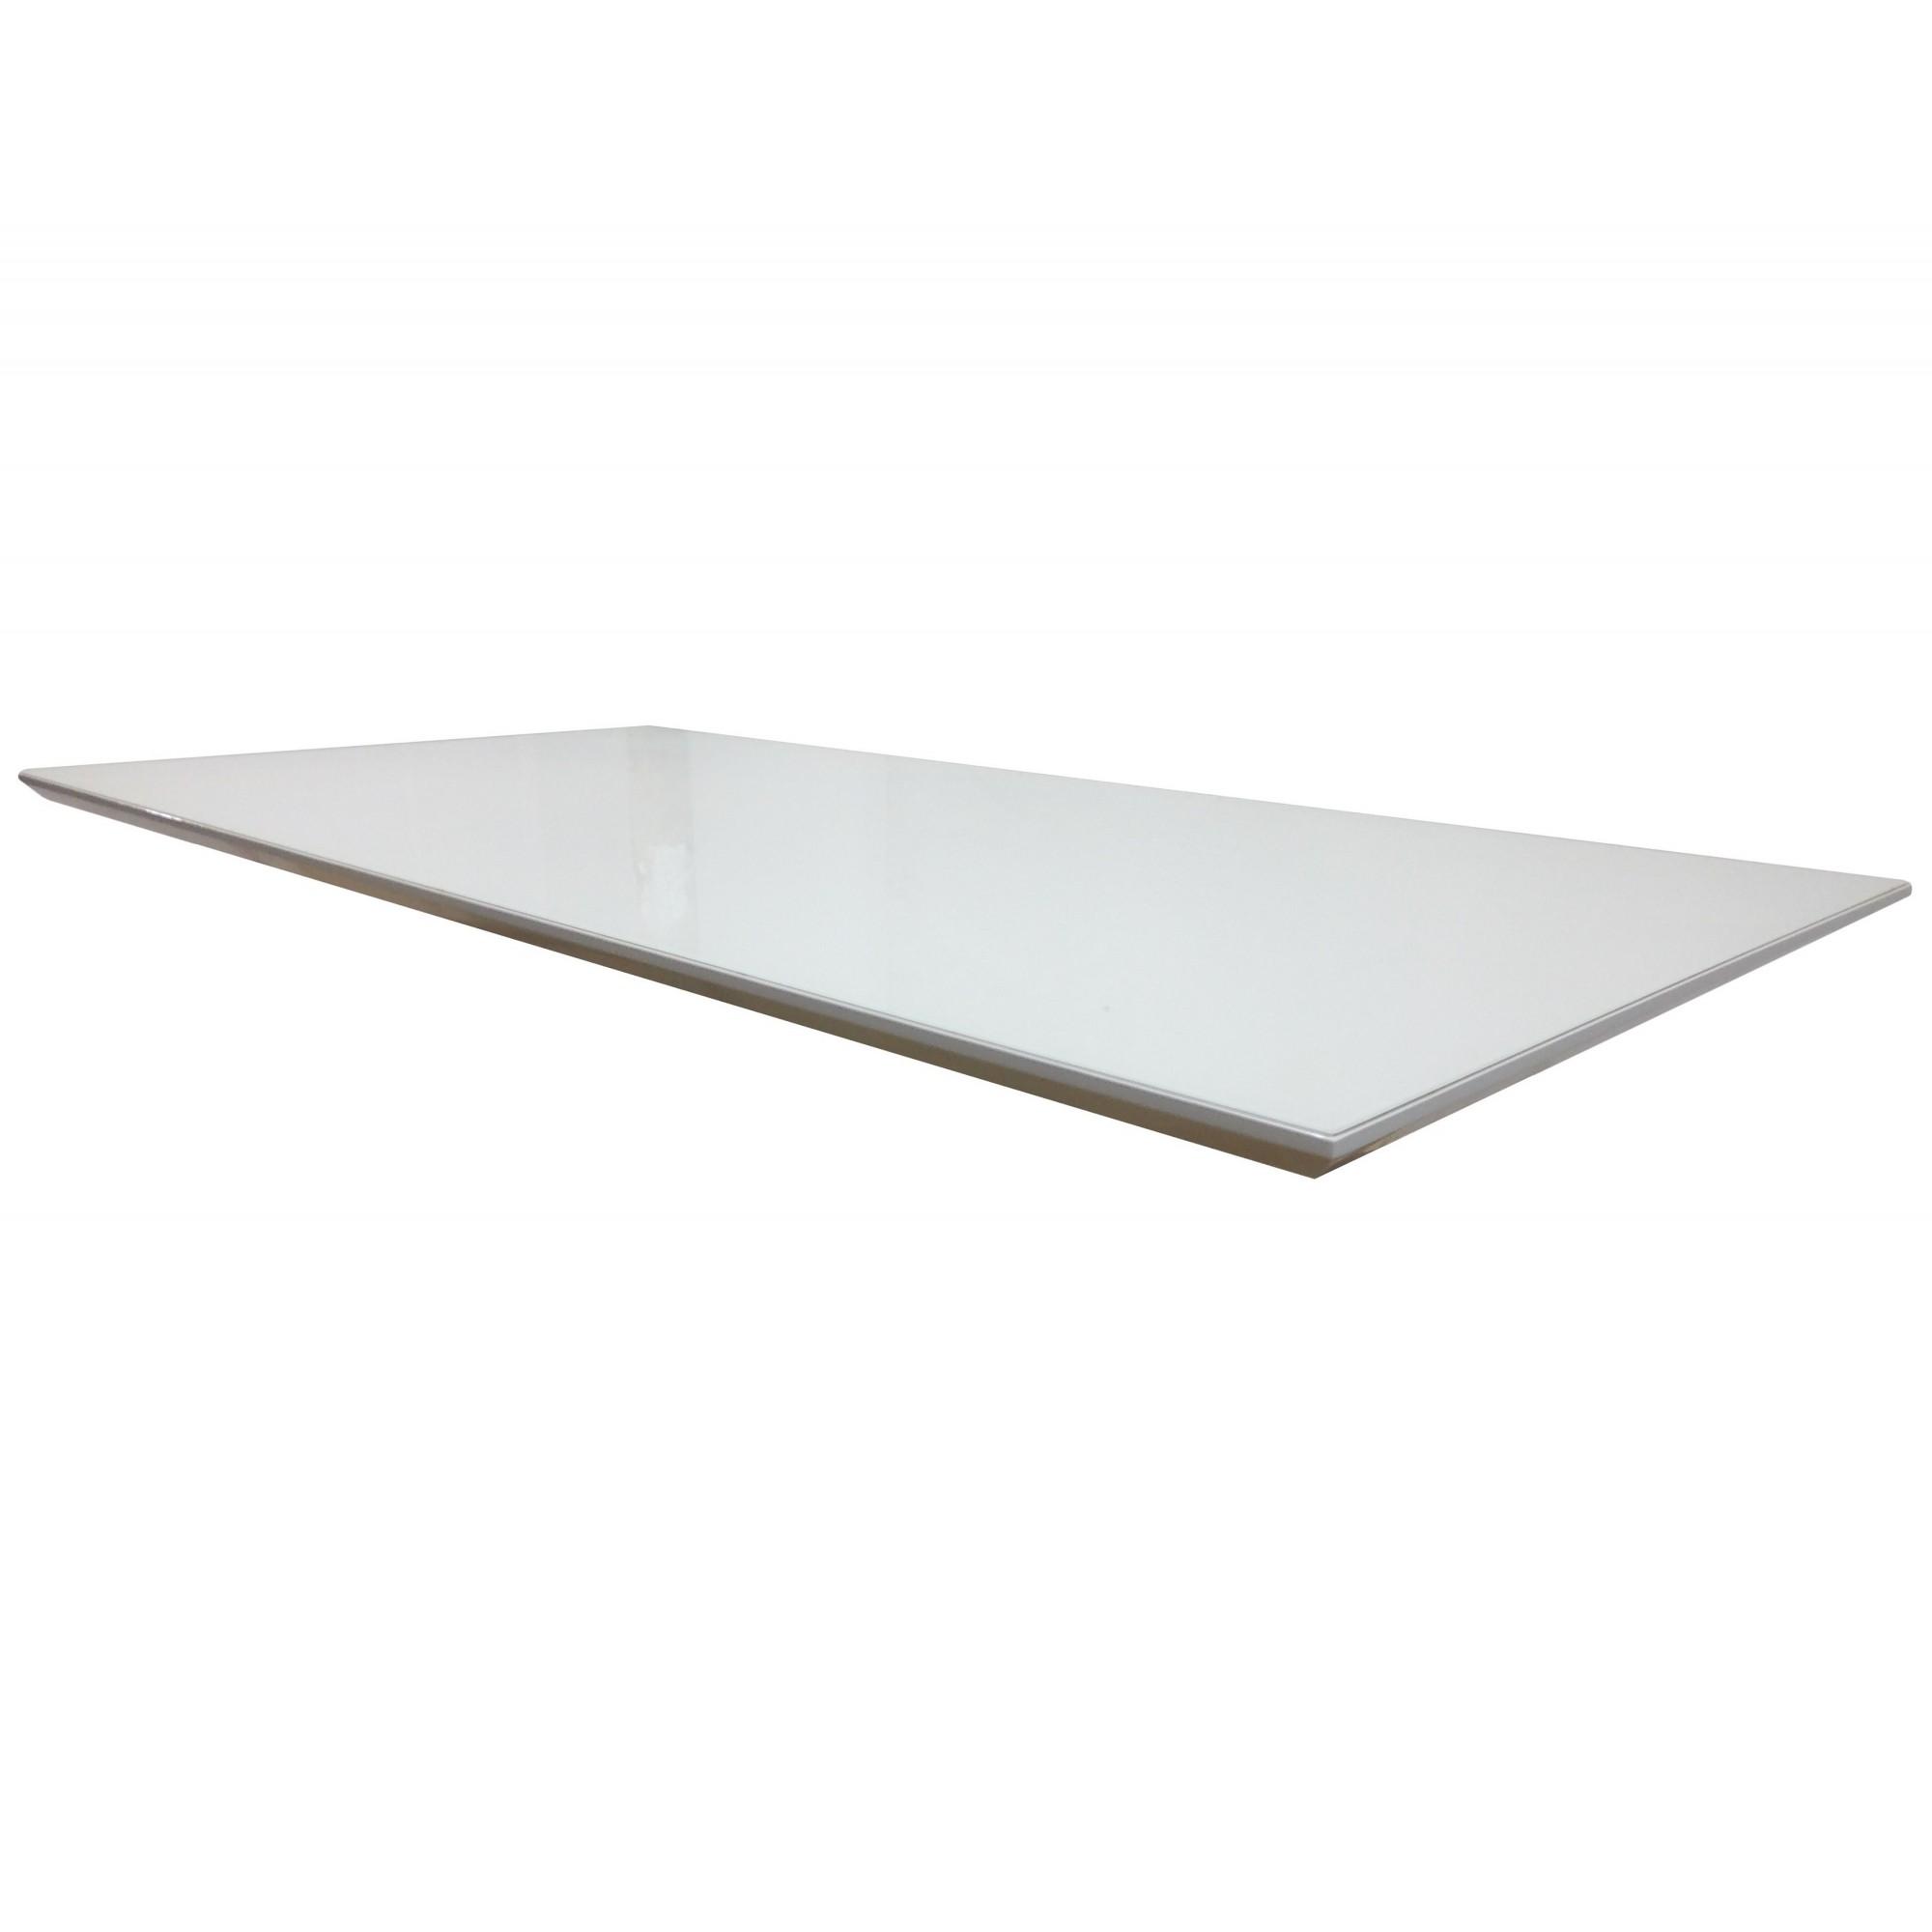 Tampo de MDF Mesa Sala Jantar Laqueado com Vidro 1,4 x 1,4 m